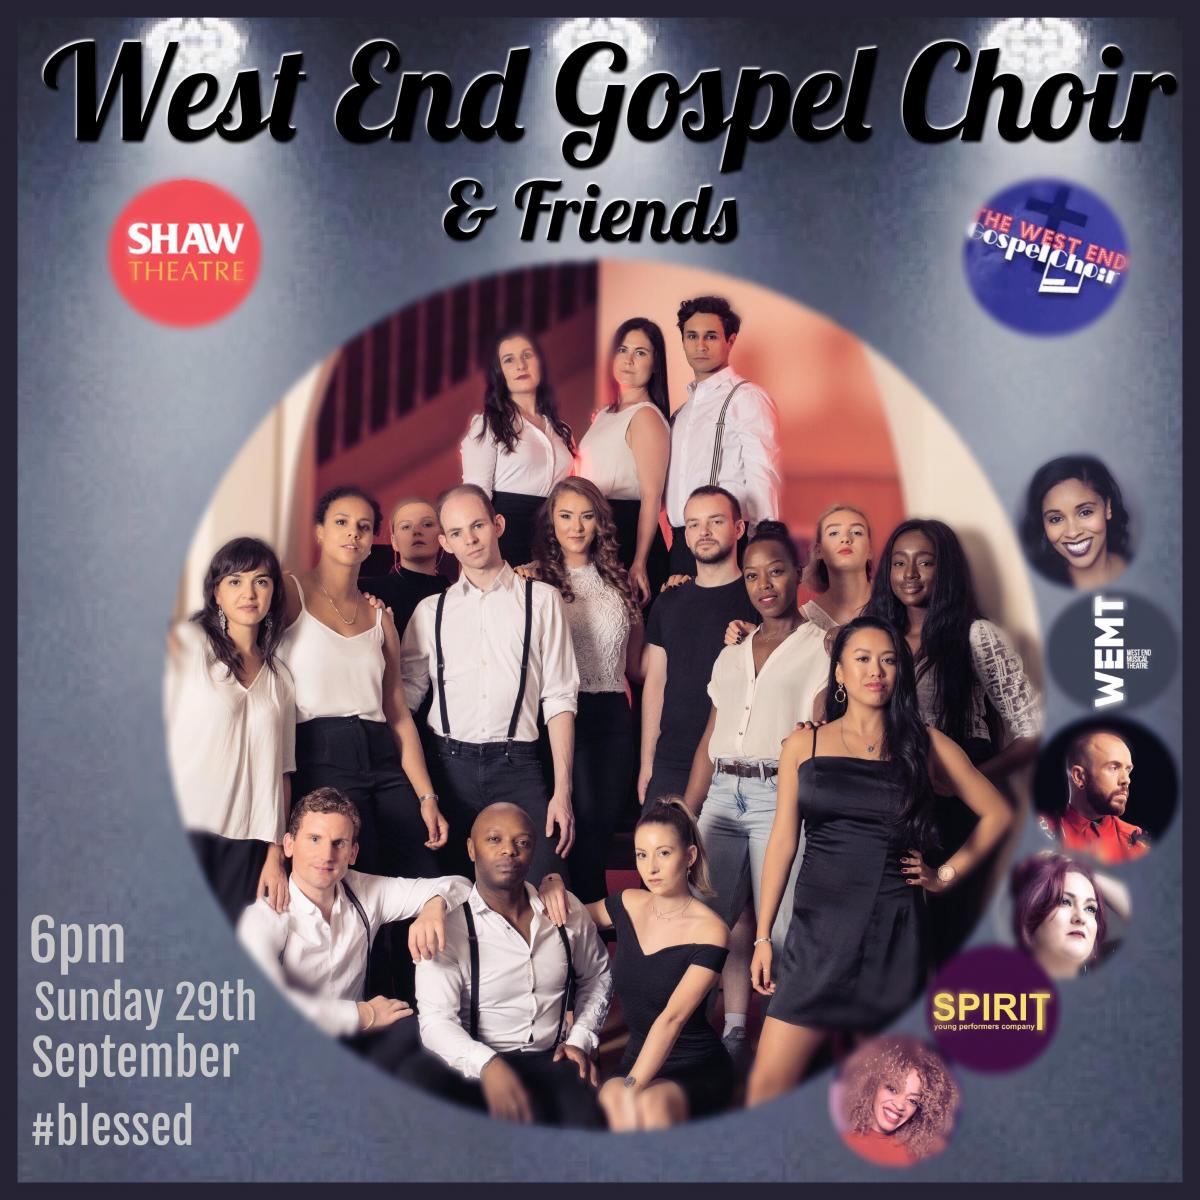 The West End Gospel Choir and Friends